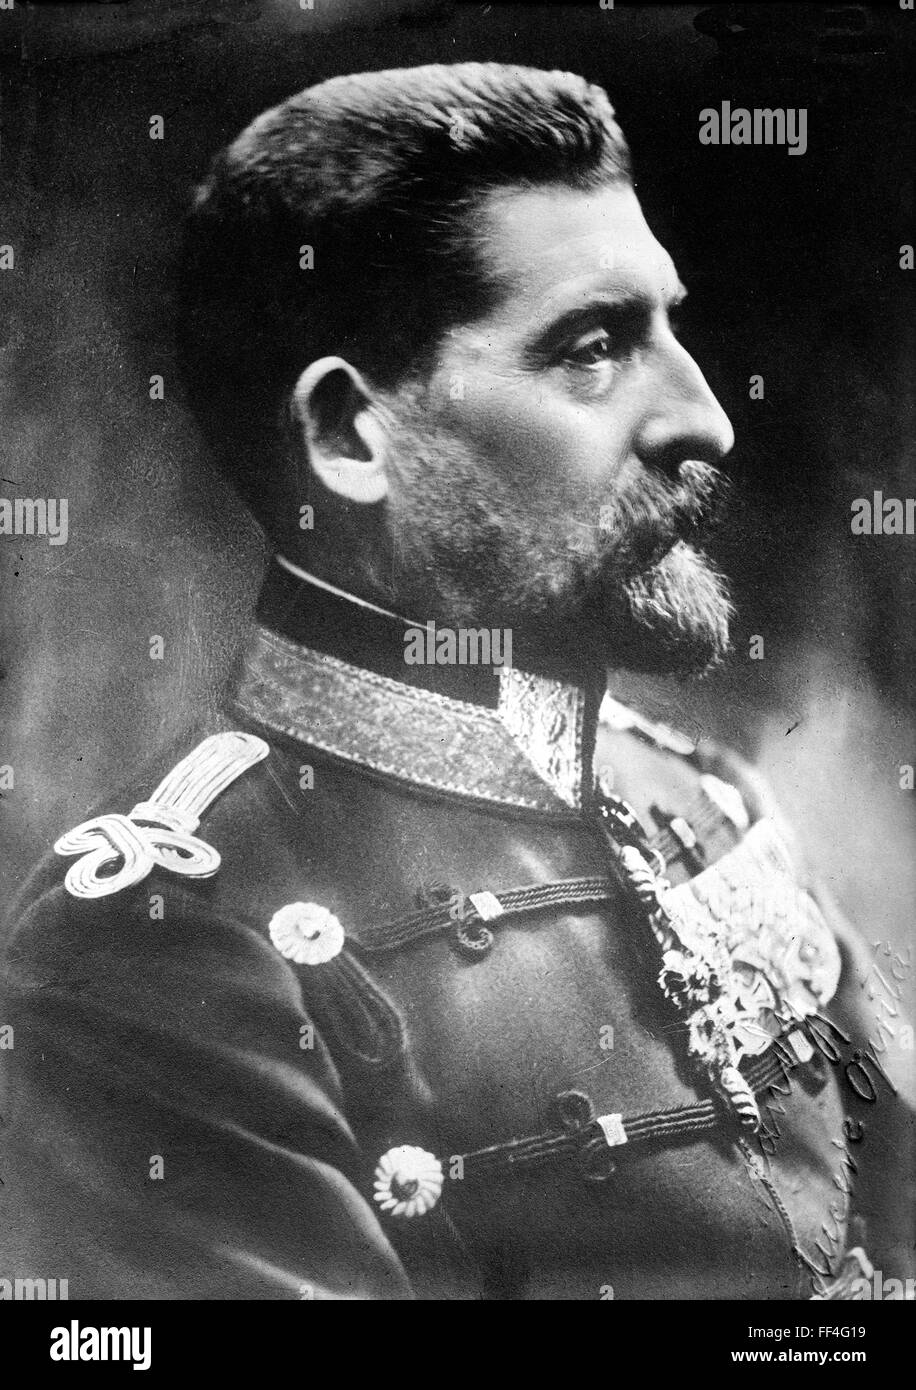 FERDINAND I OF ROMANIA (1865-1927) - Stock Image